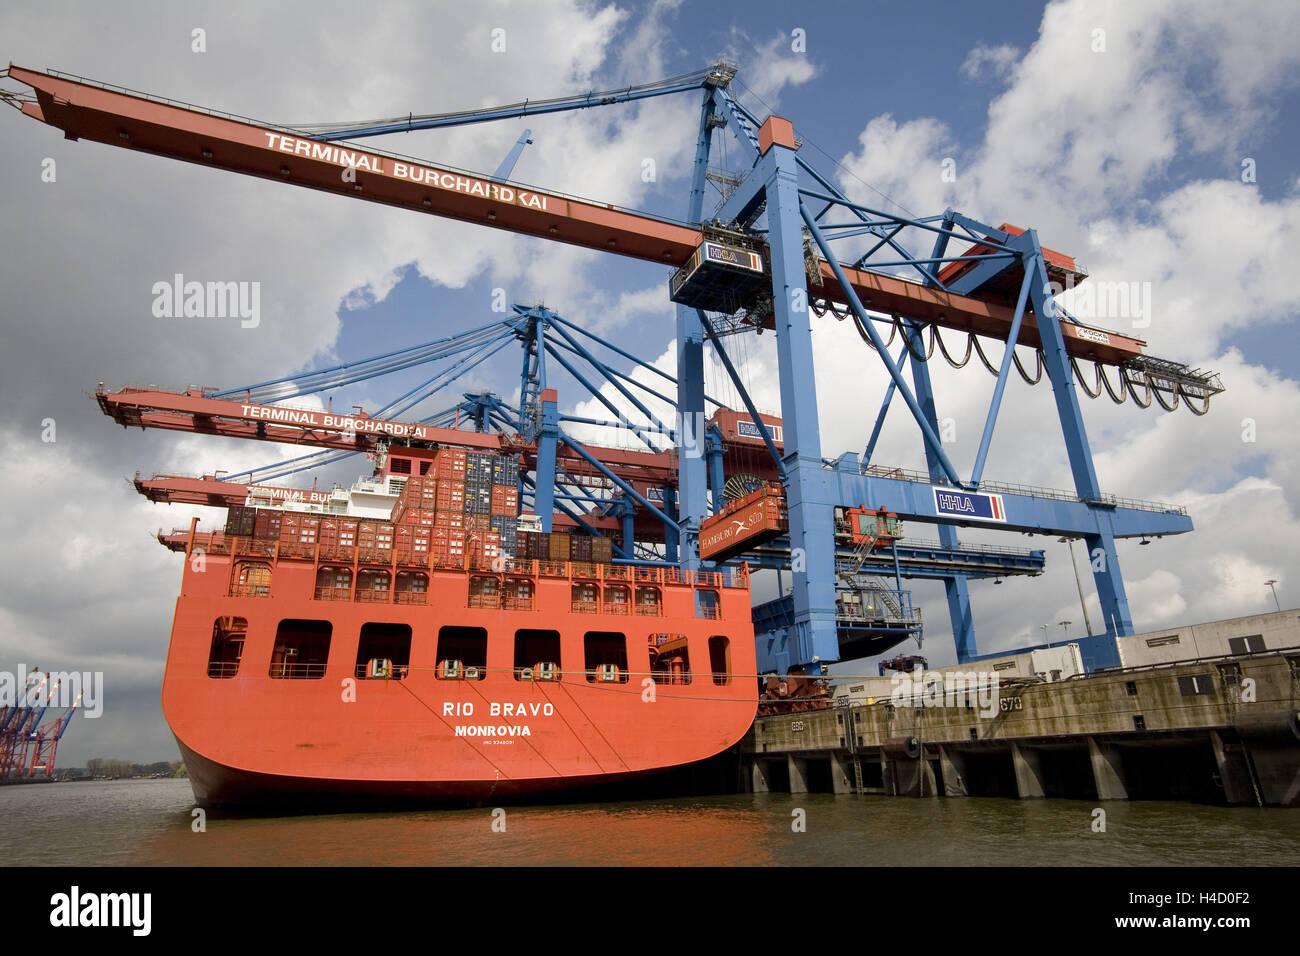 Container ship Rio Bravo Monrovia in the Hamburg harbour - Stock Image